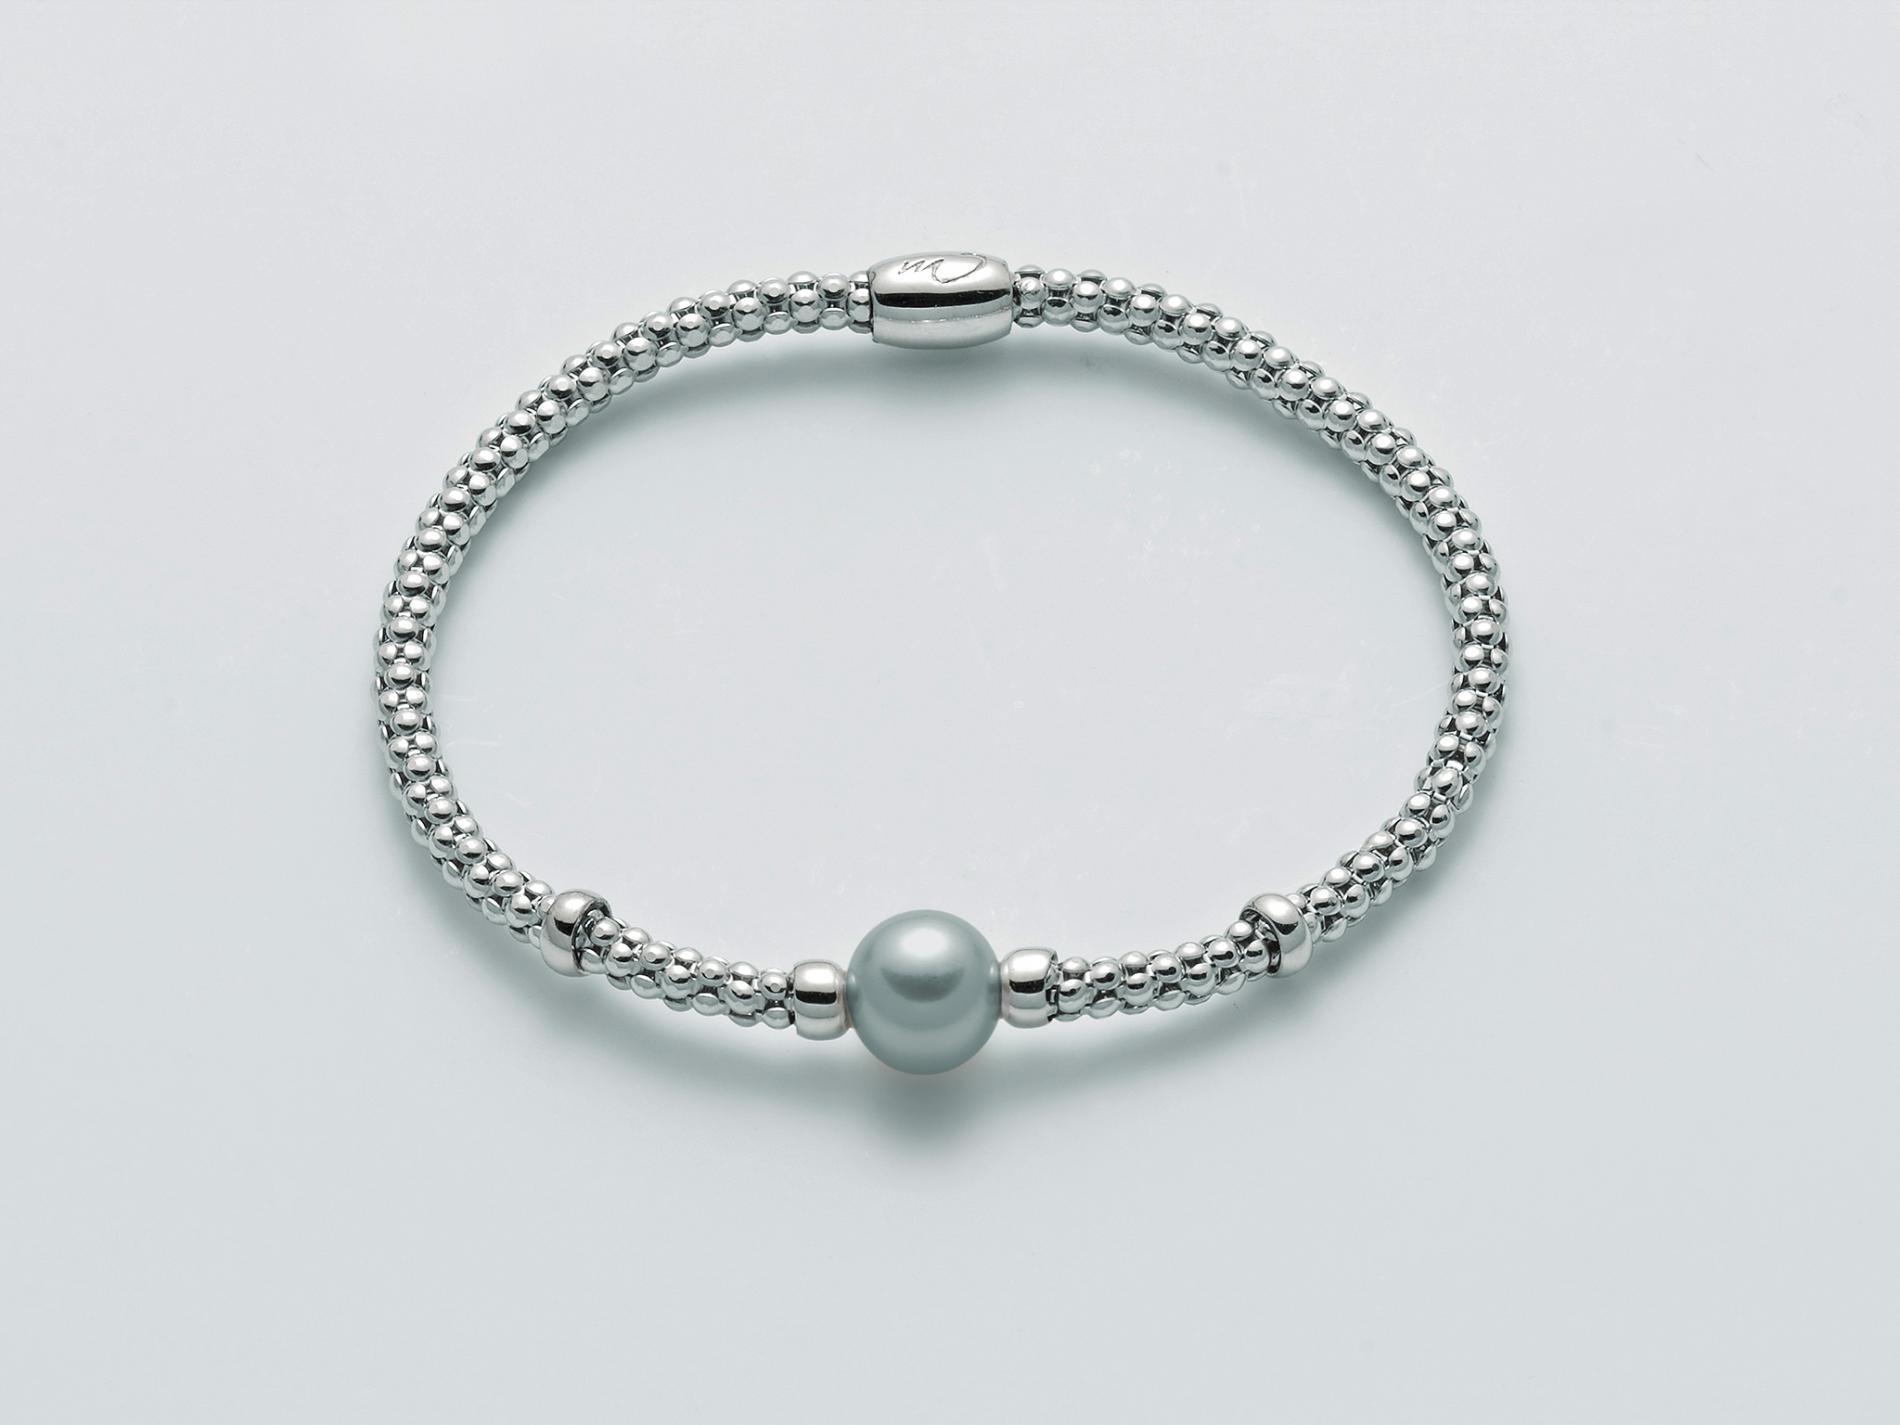 Bracciale argento Miluna PBR2993 S